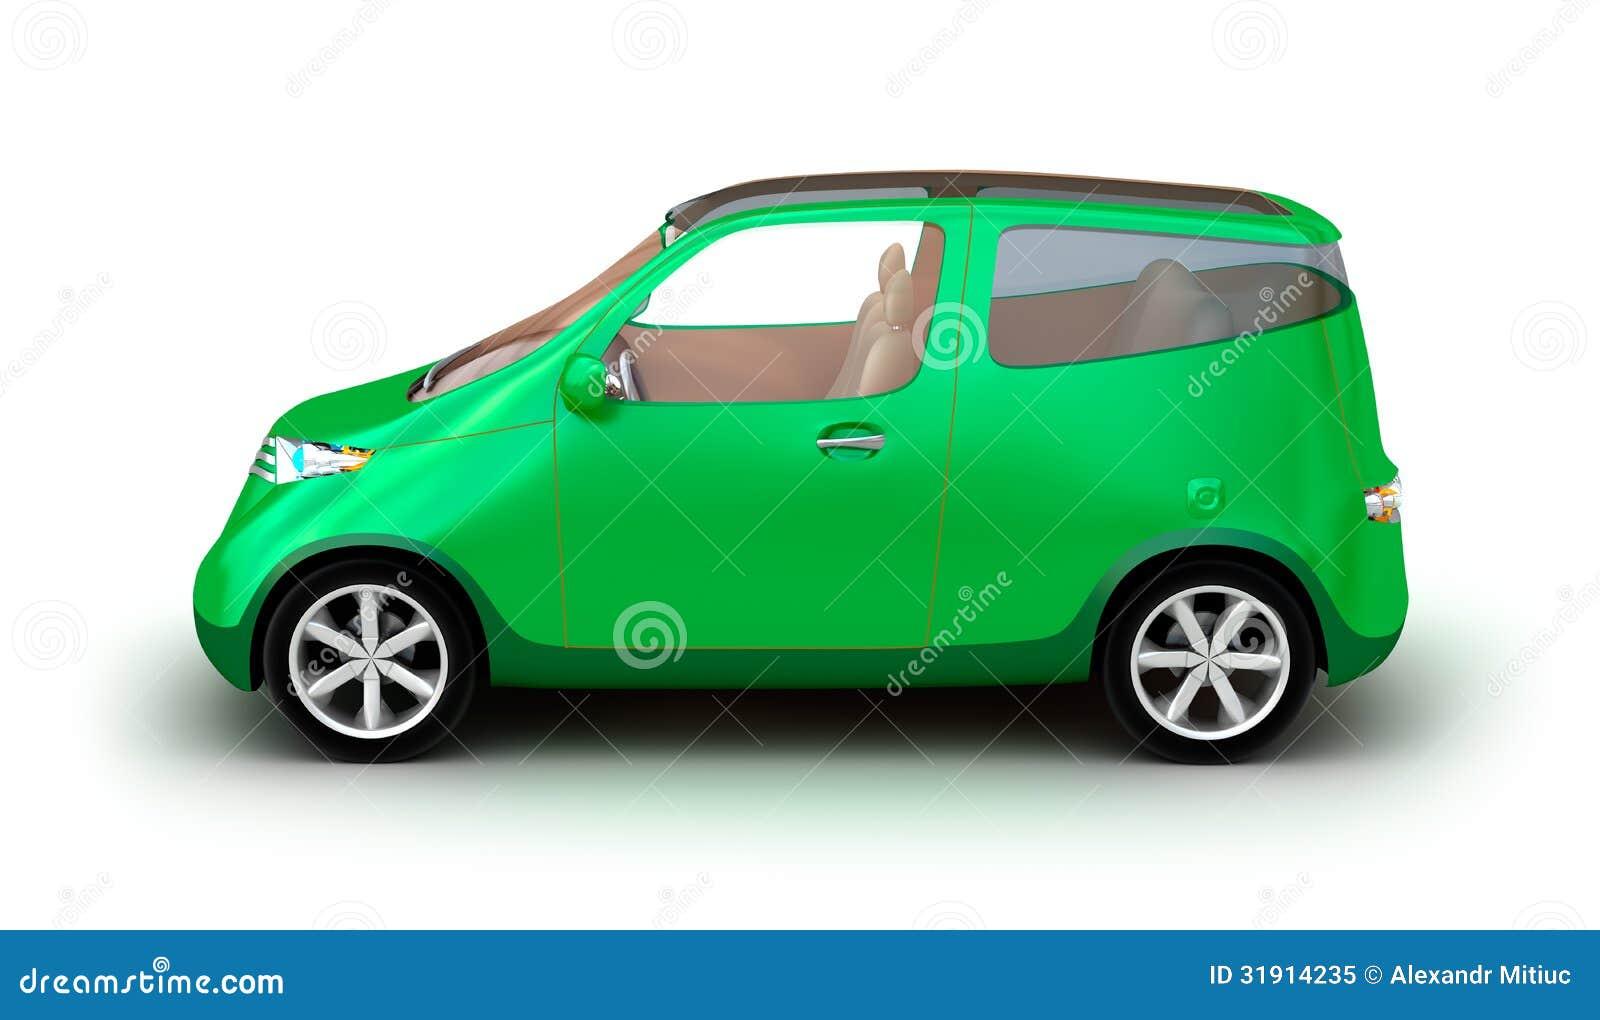 compact car on white background stock illustration image 31914235. Black Bedroom Furniture Sets. Home Design Ideas